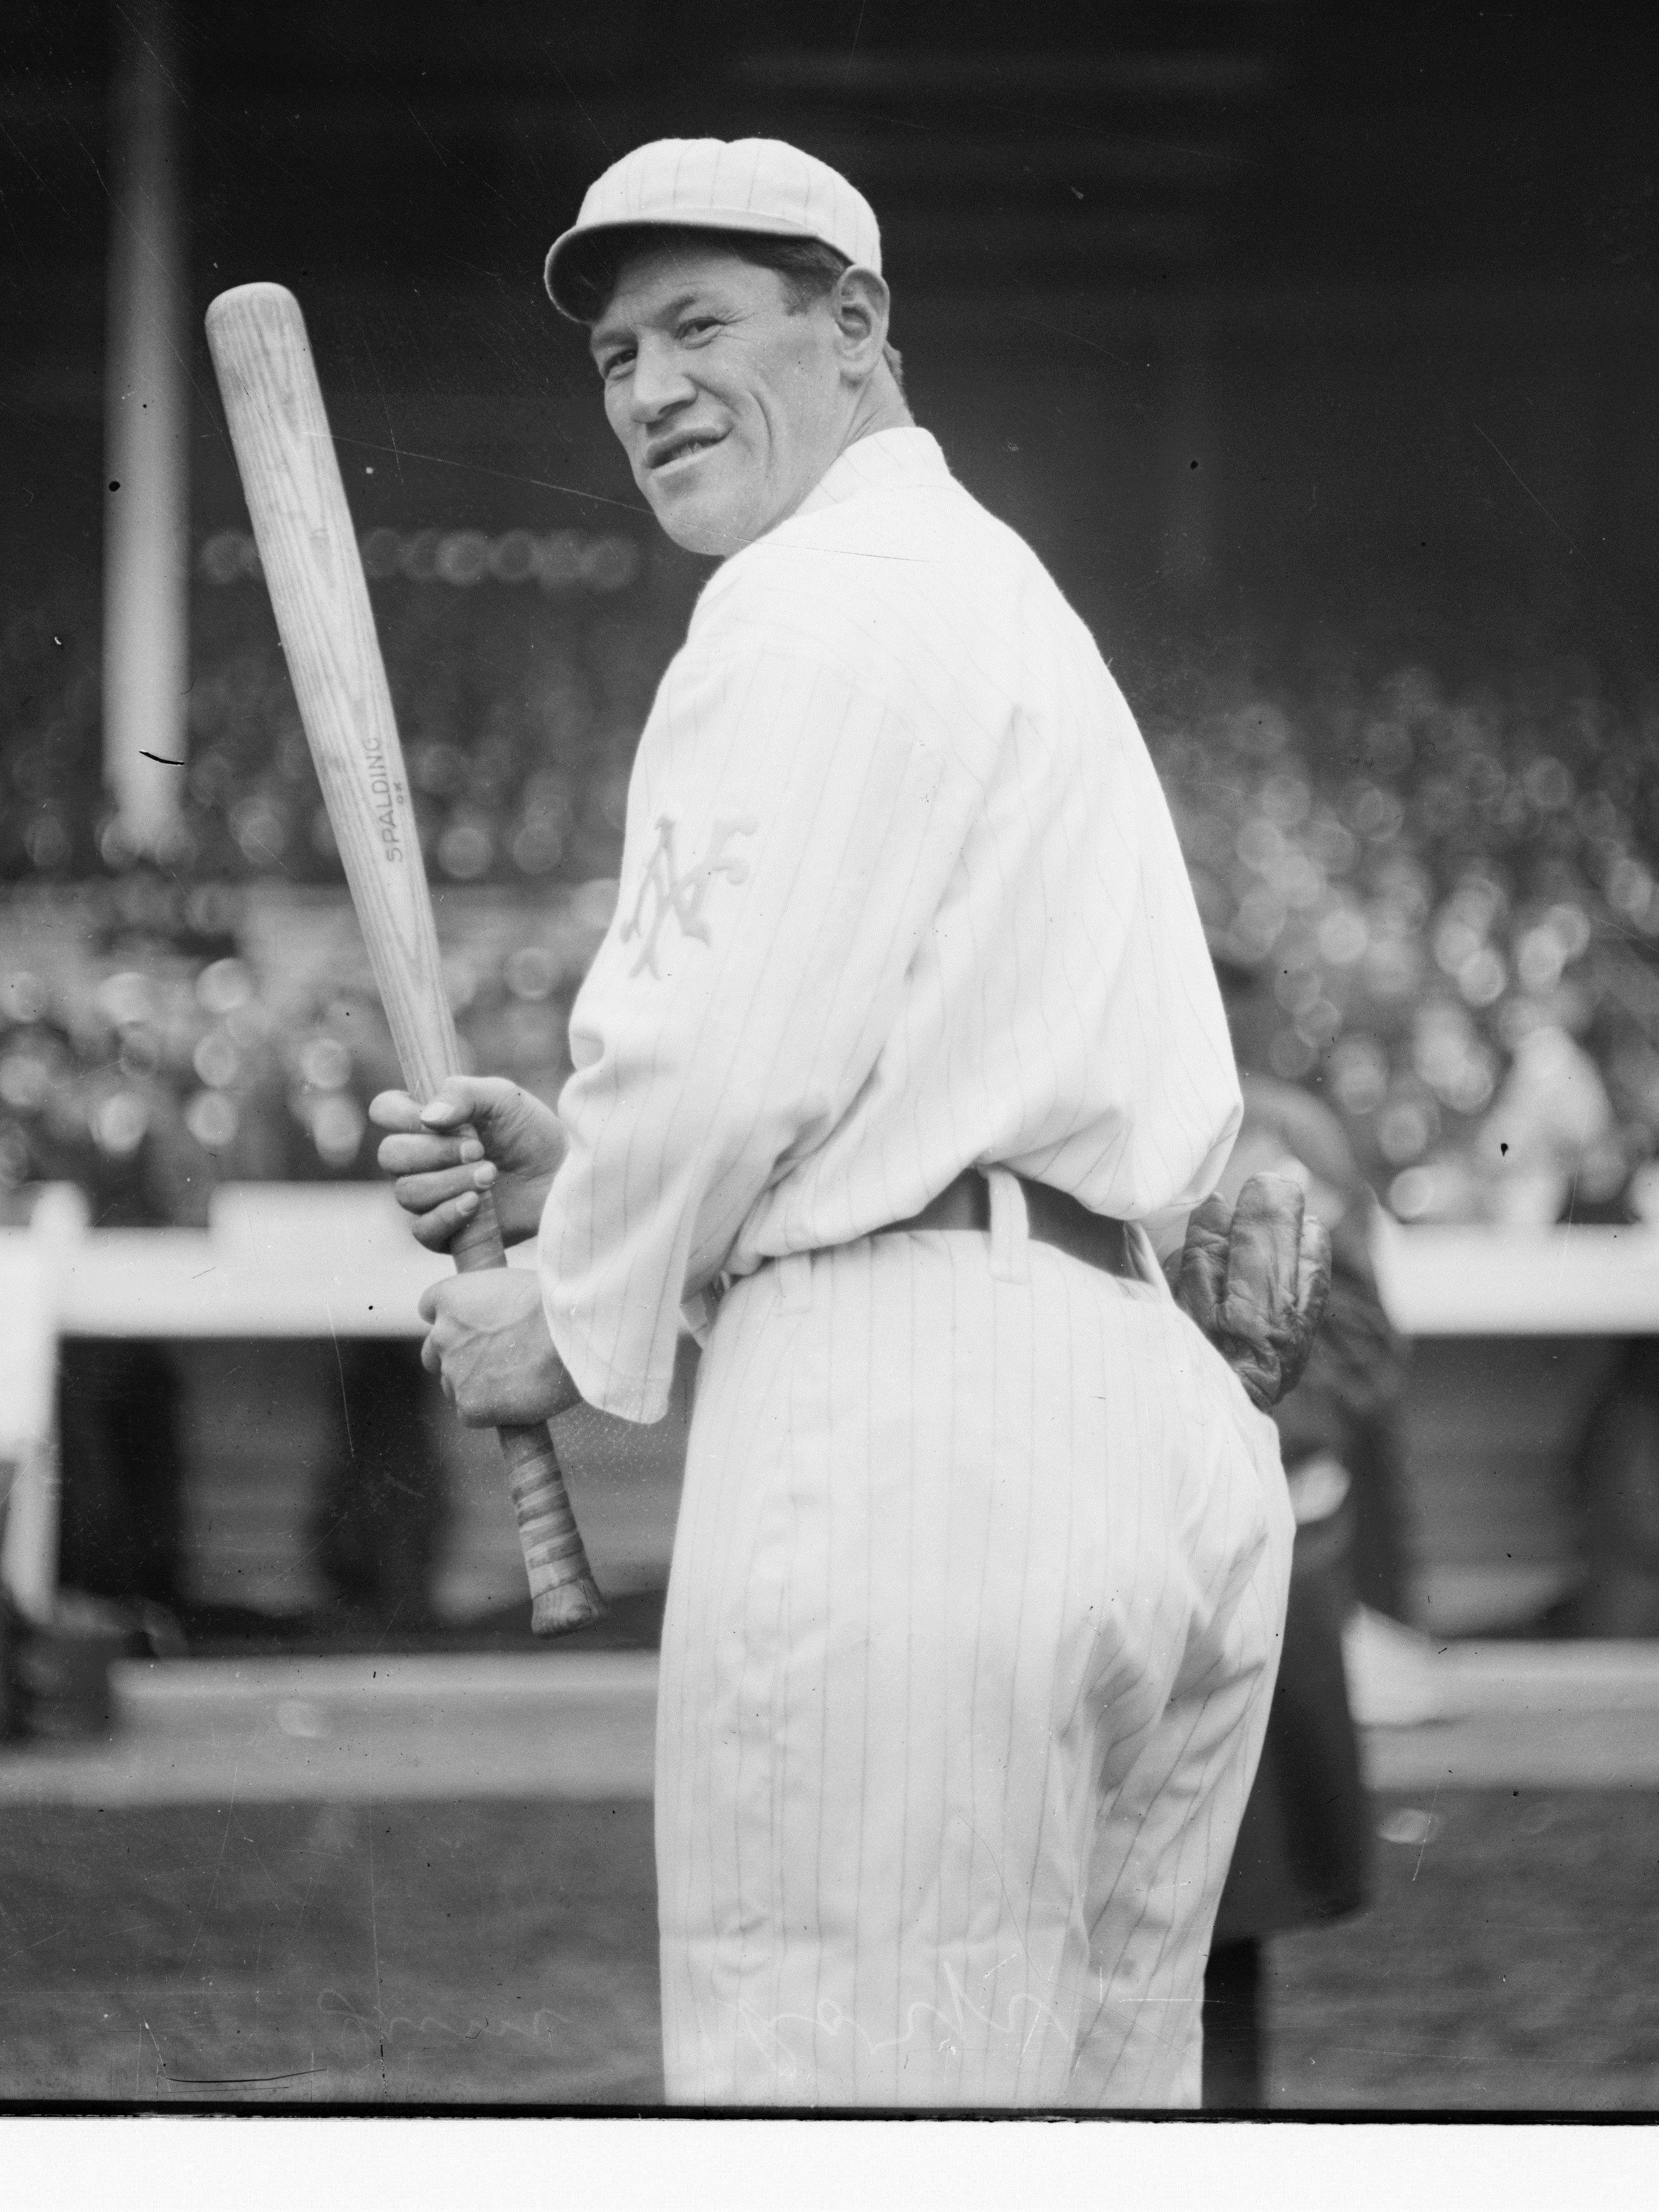 Jim Thorpe New York Giants 1913 American athletes